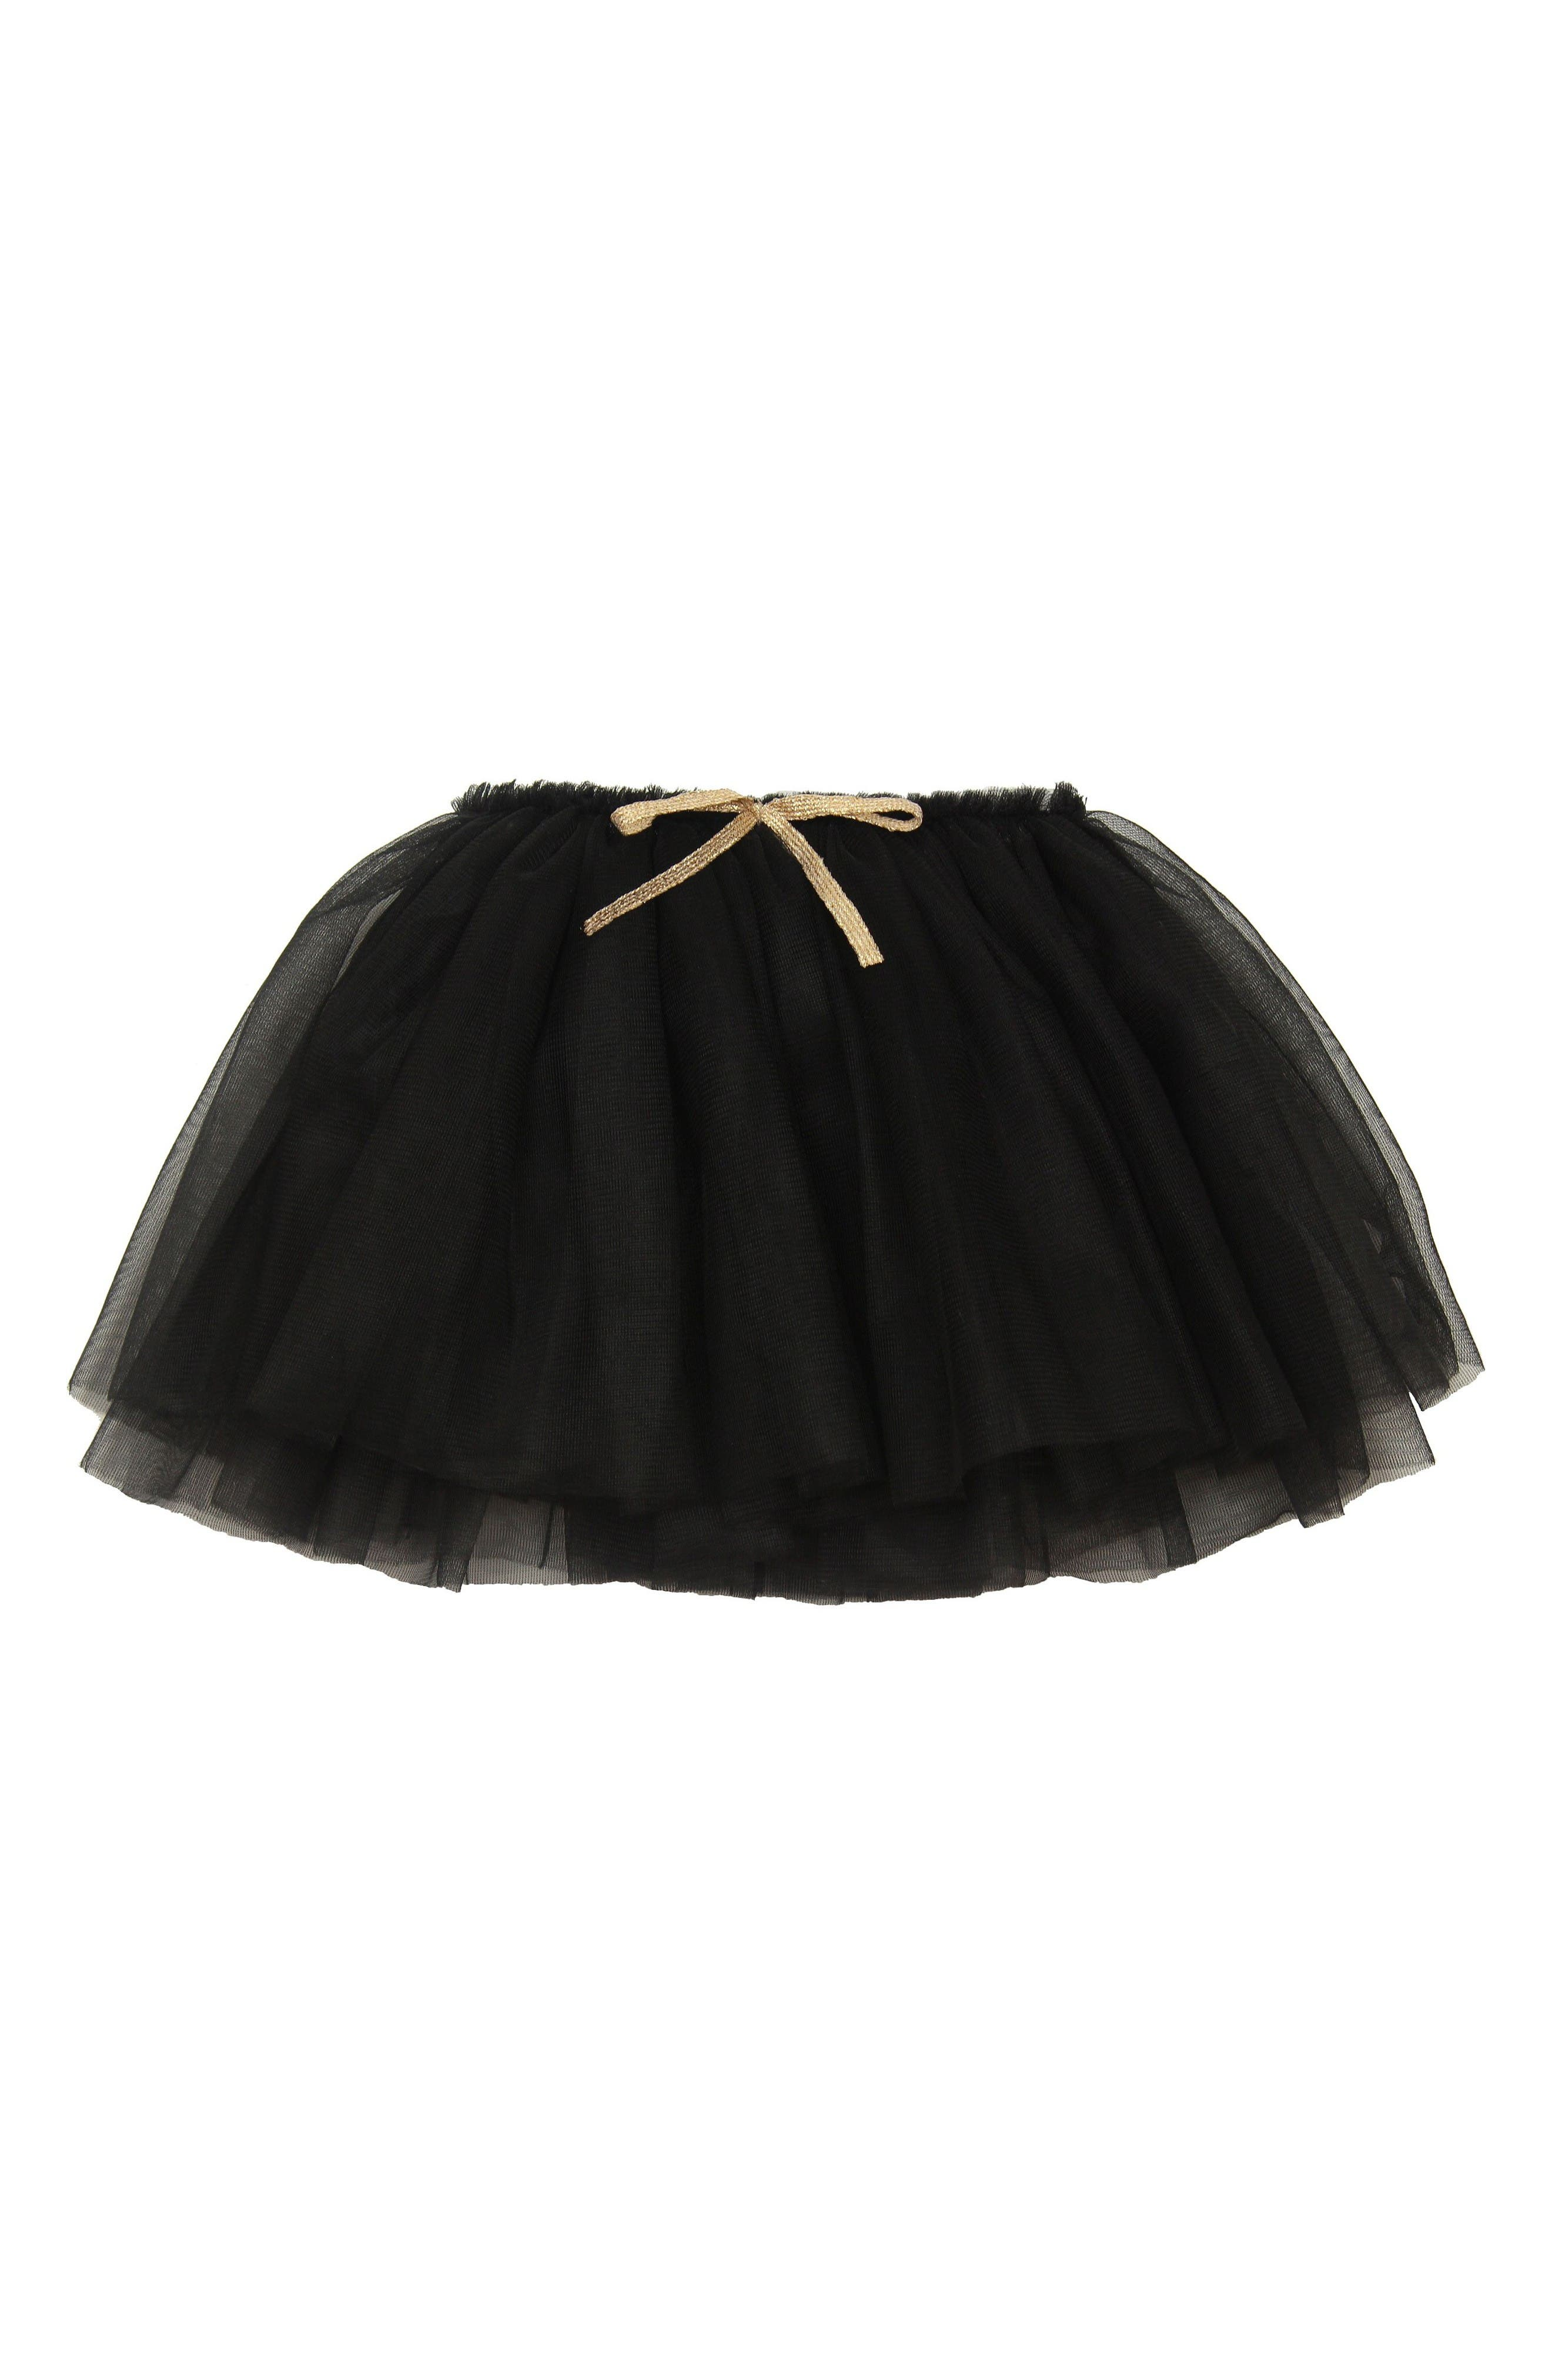 Tutu Skirt,                         Main,                         color, Black